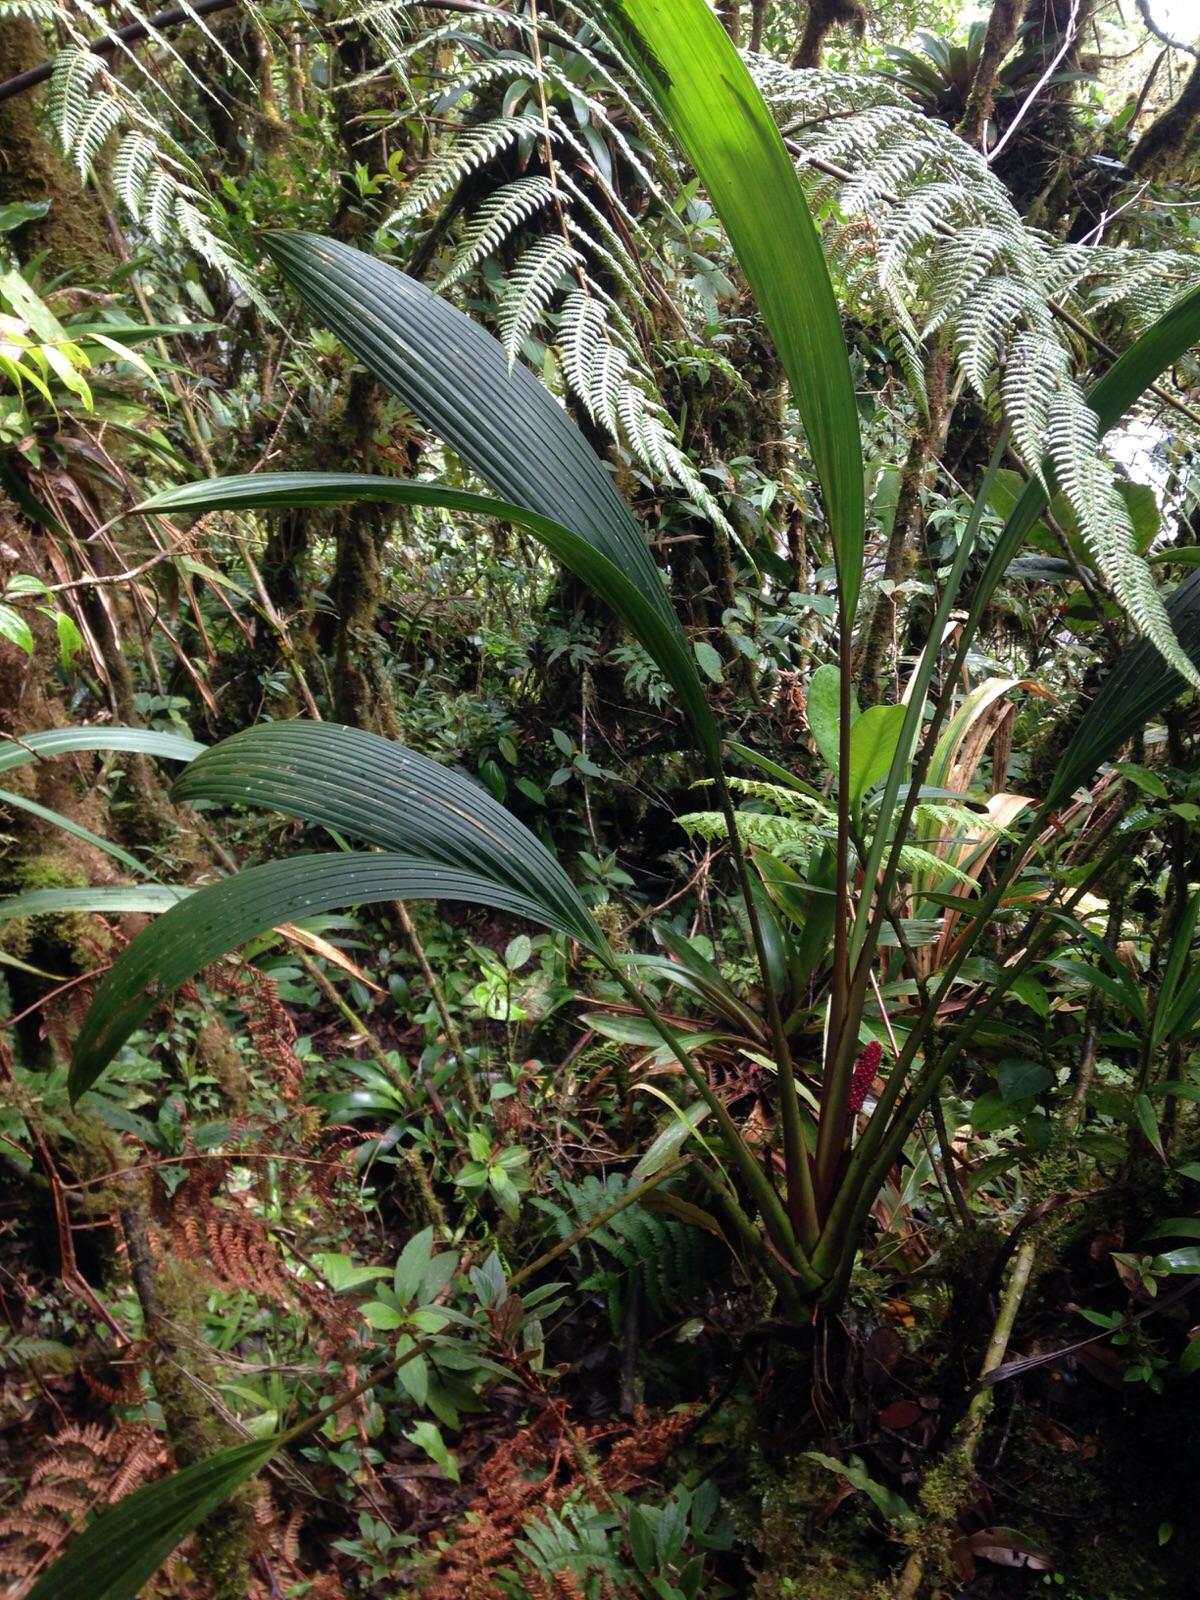 Sphaeradenia praetermissa , Veraguas, Panamá (Image: F. Muller)